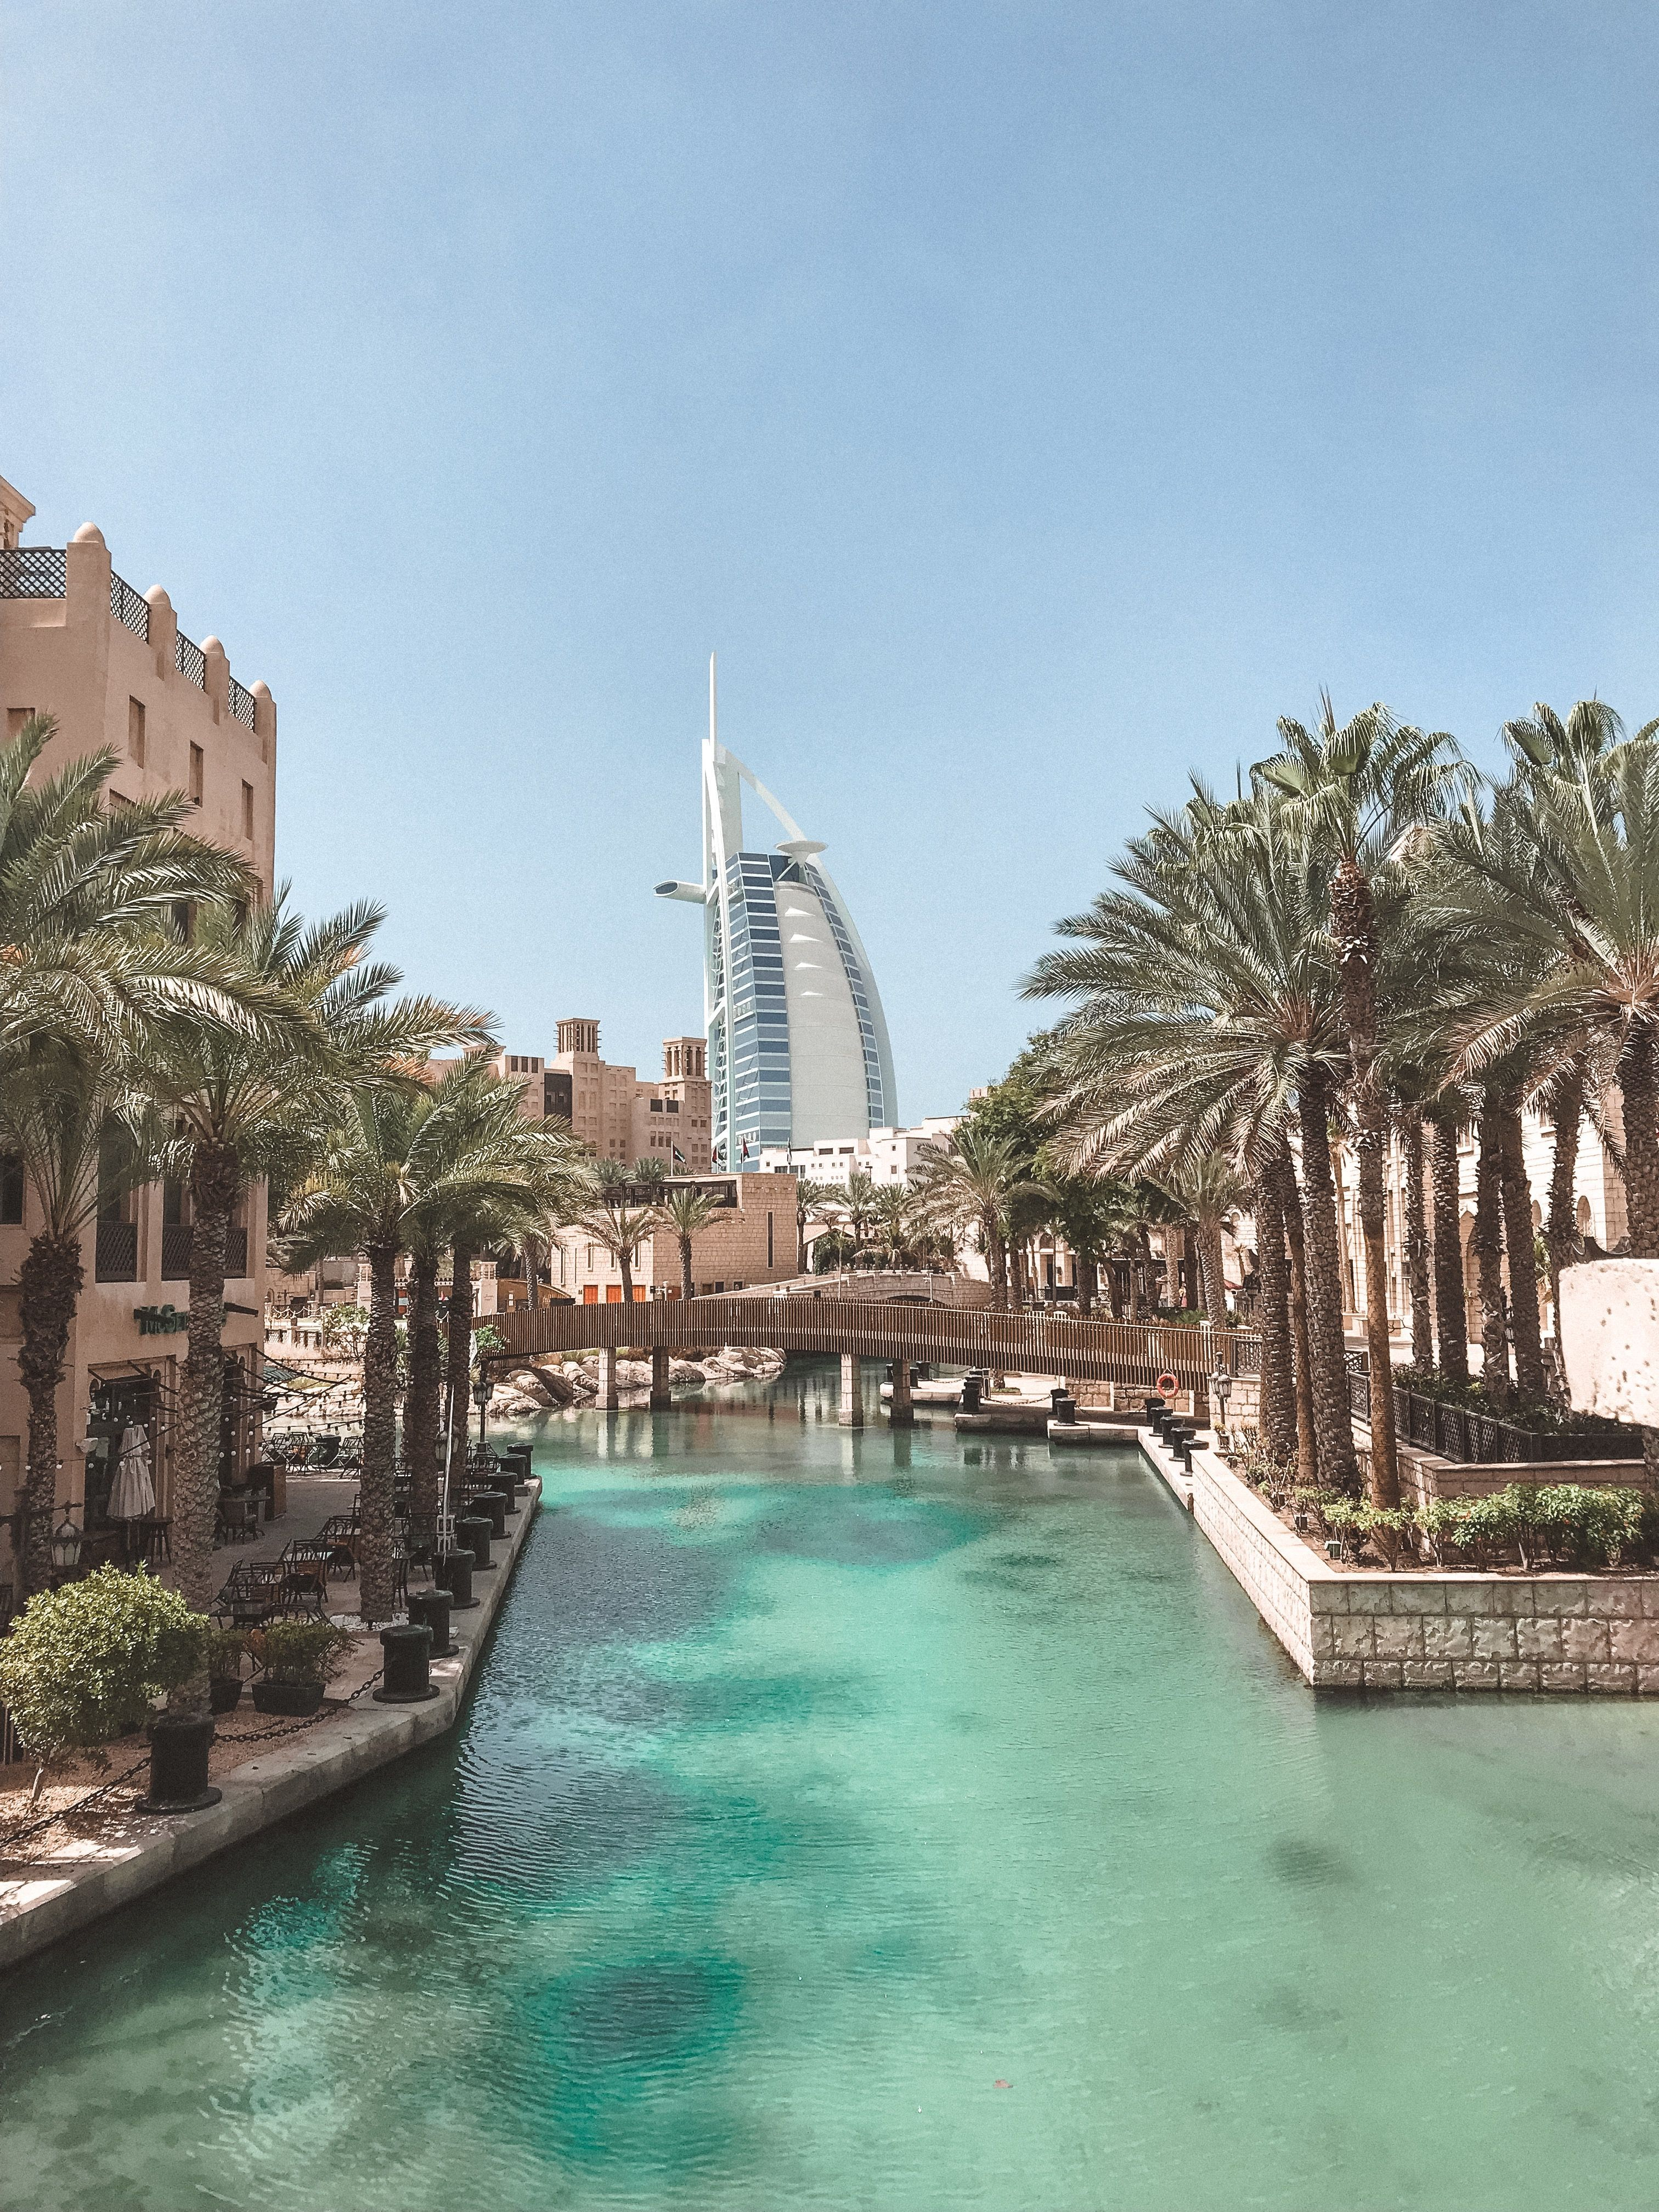 #dubai #mydubai #mydubai #visitdubai #uae #unitedarabemirates #travel #traveltips #travelphotography #bucketlist Photos of 🏝️ UAE #uae #uaetravel #unitedarabemirates #оаэ